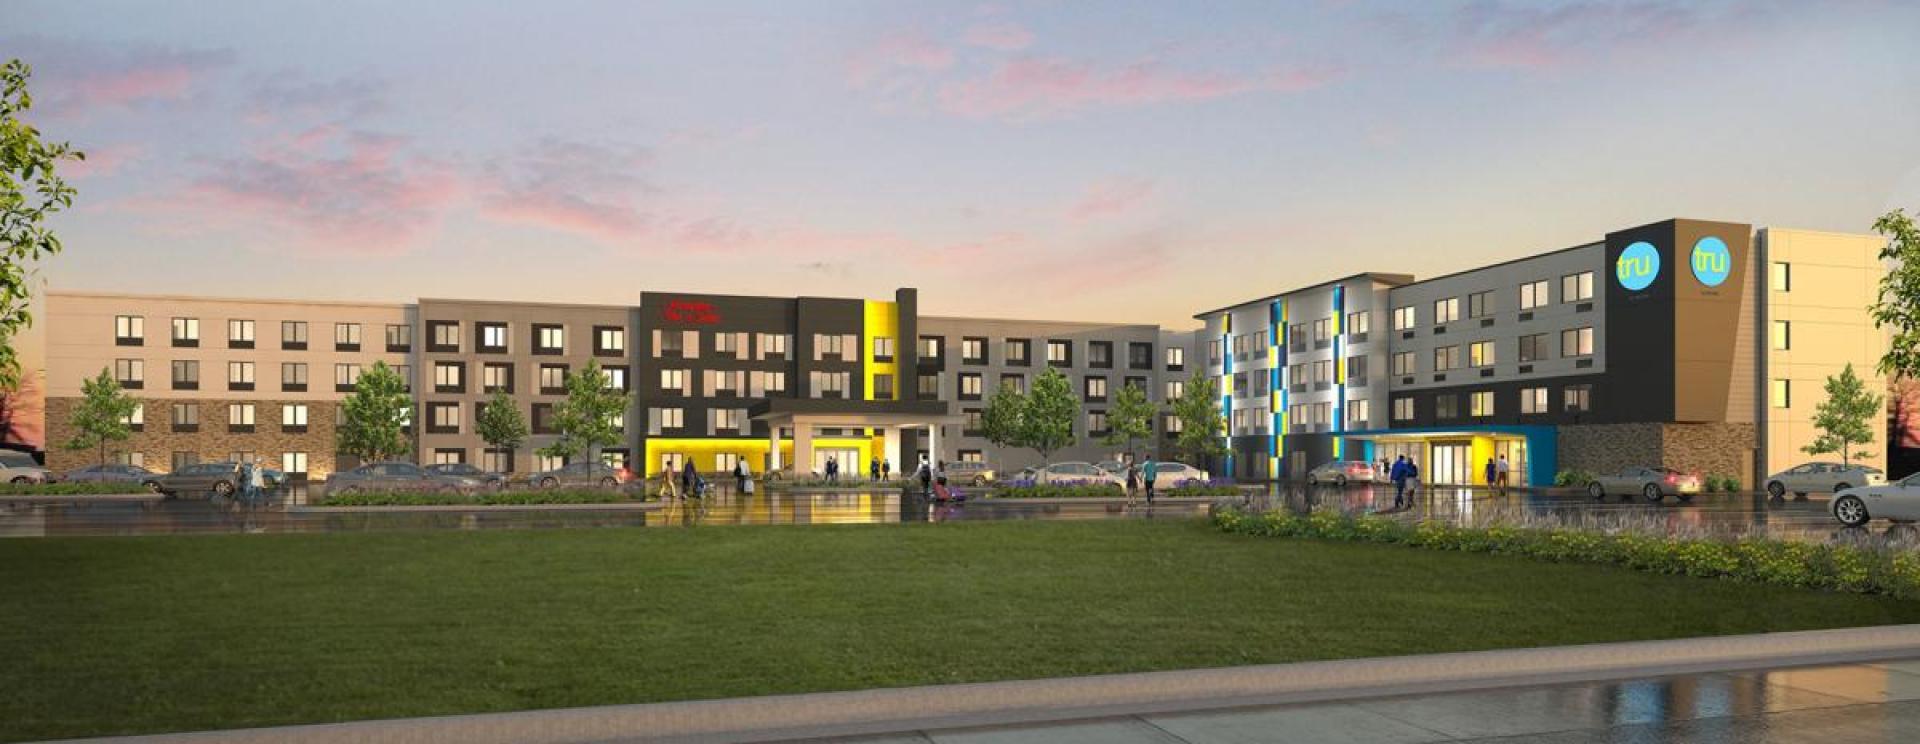 Tru by Hilton Rapid City Rushmore